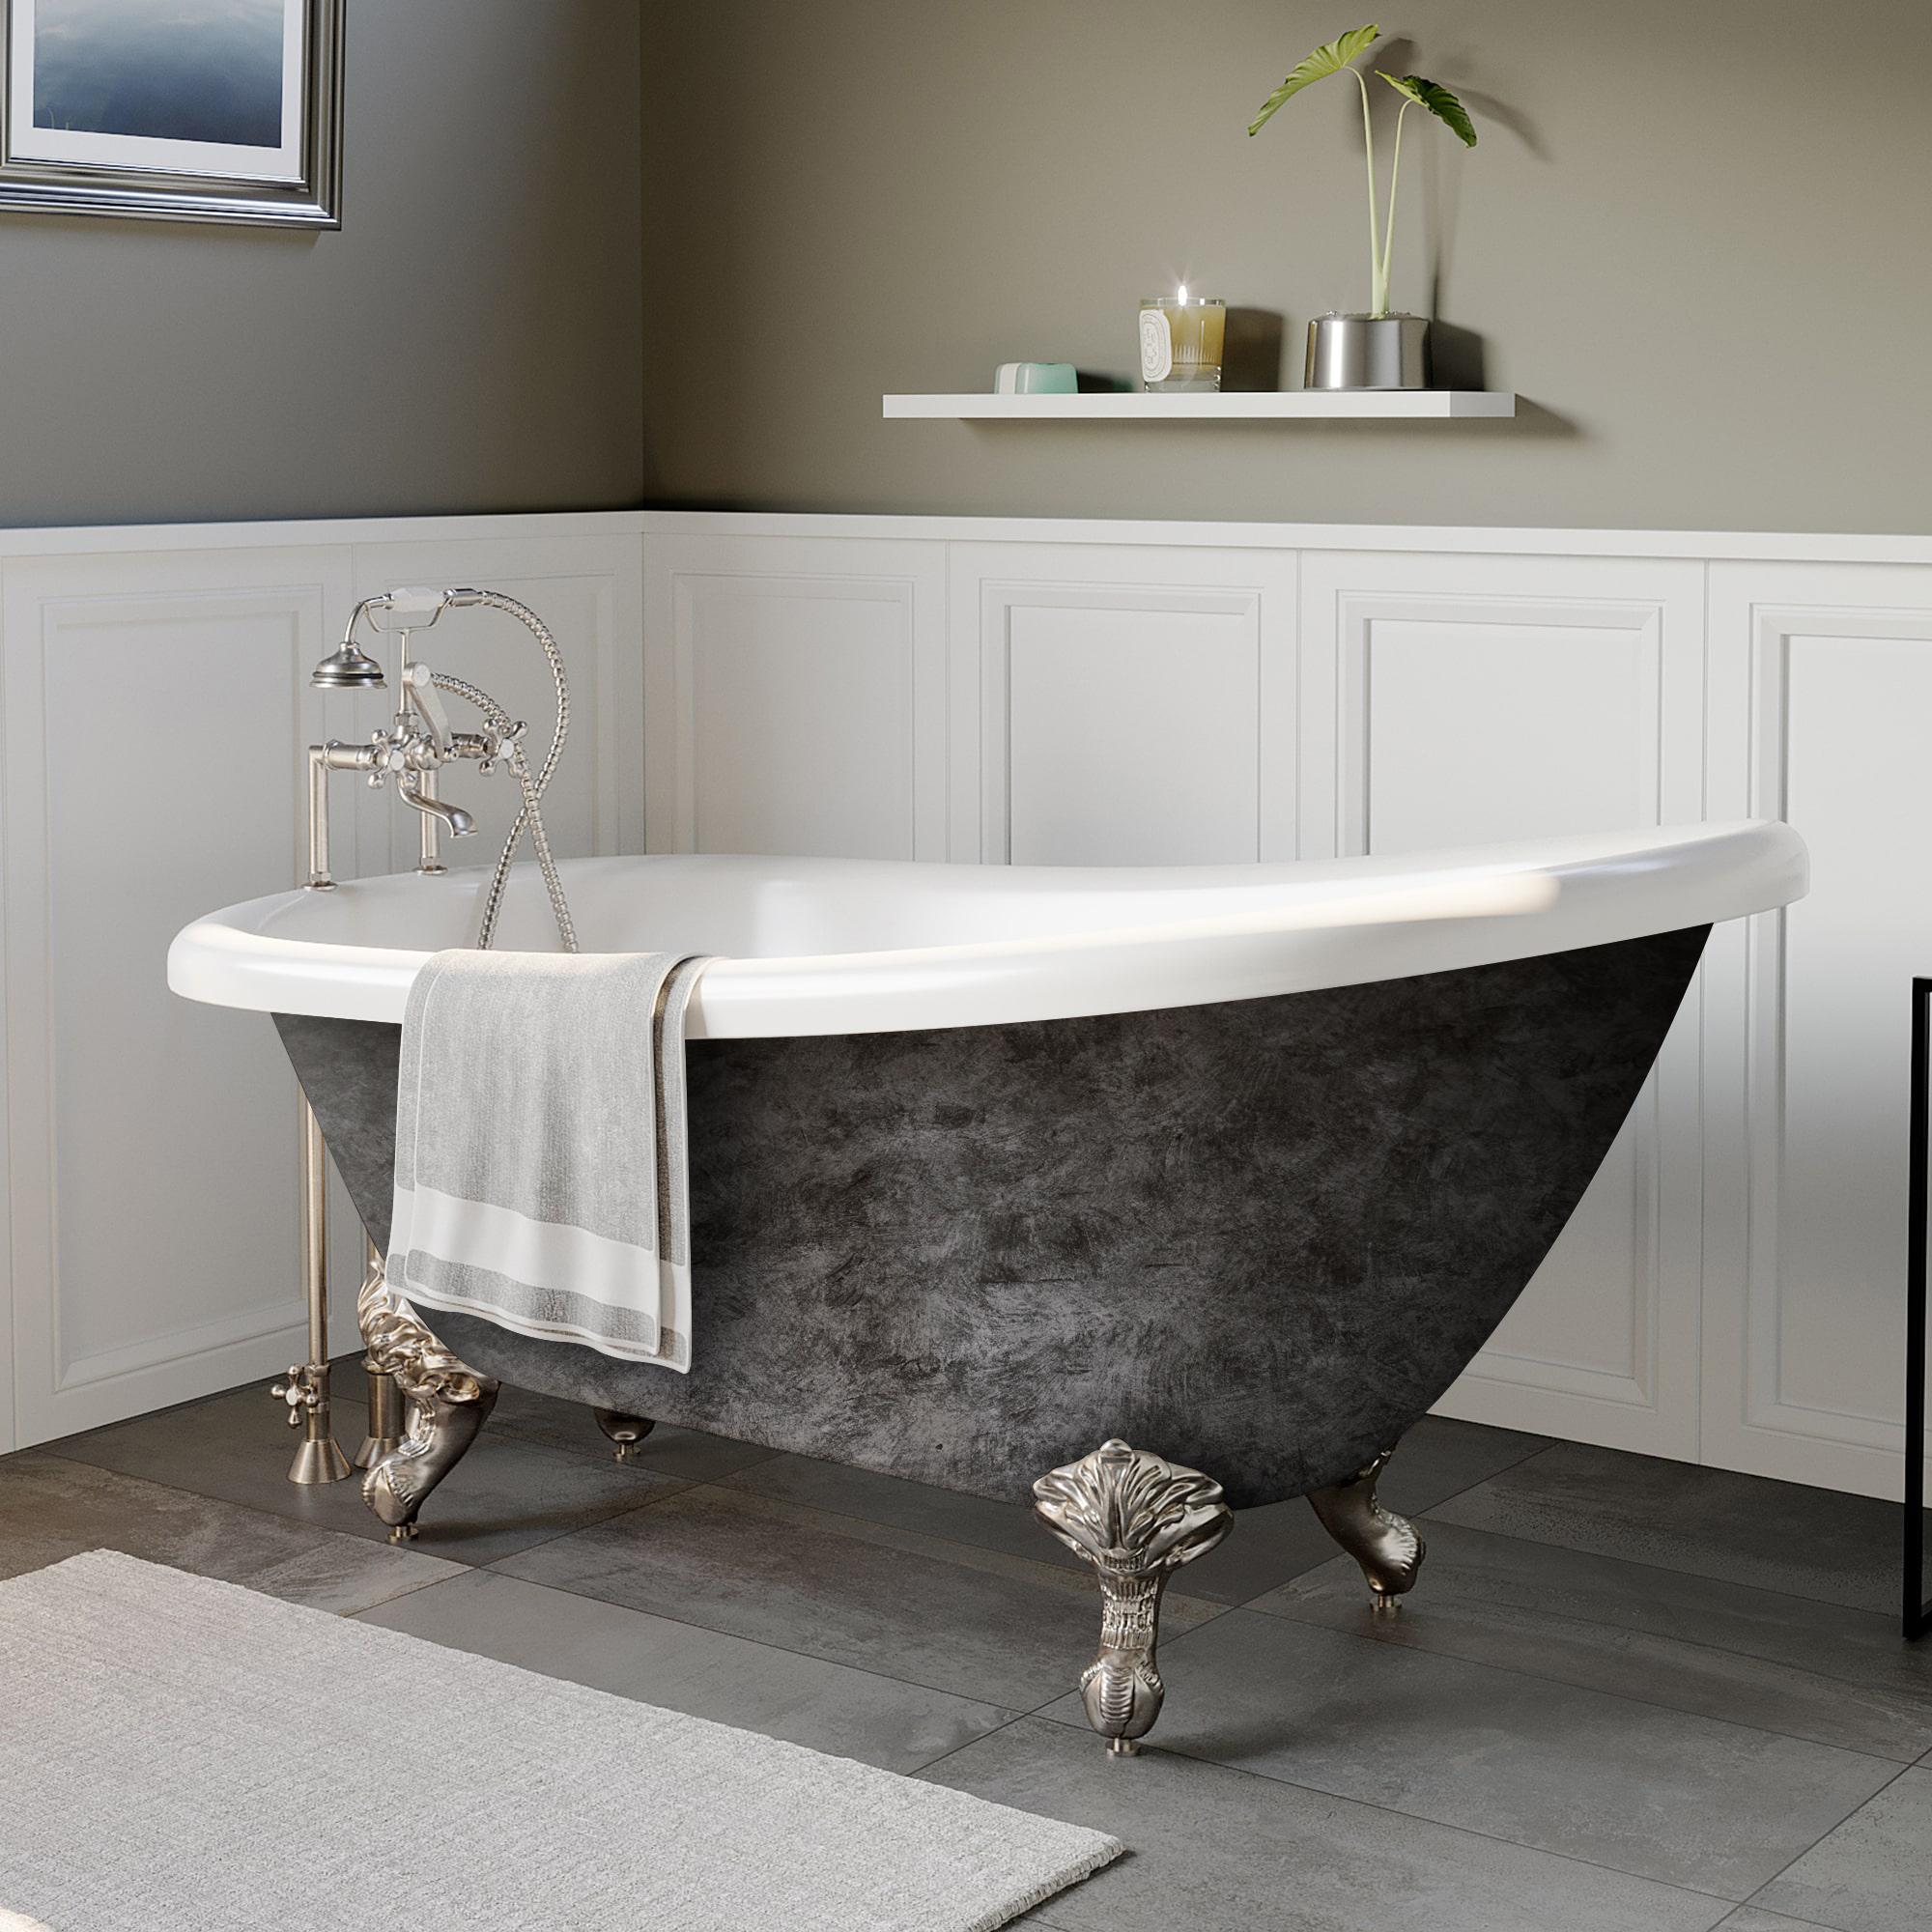 clawfoot slipper tub, acrylic slipper tub, scorched platinum tub, british telephone faucet,